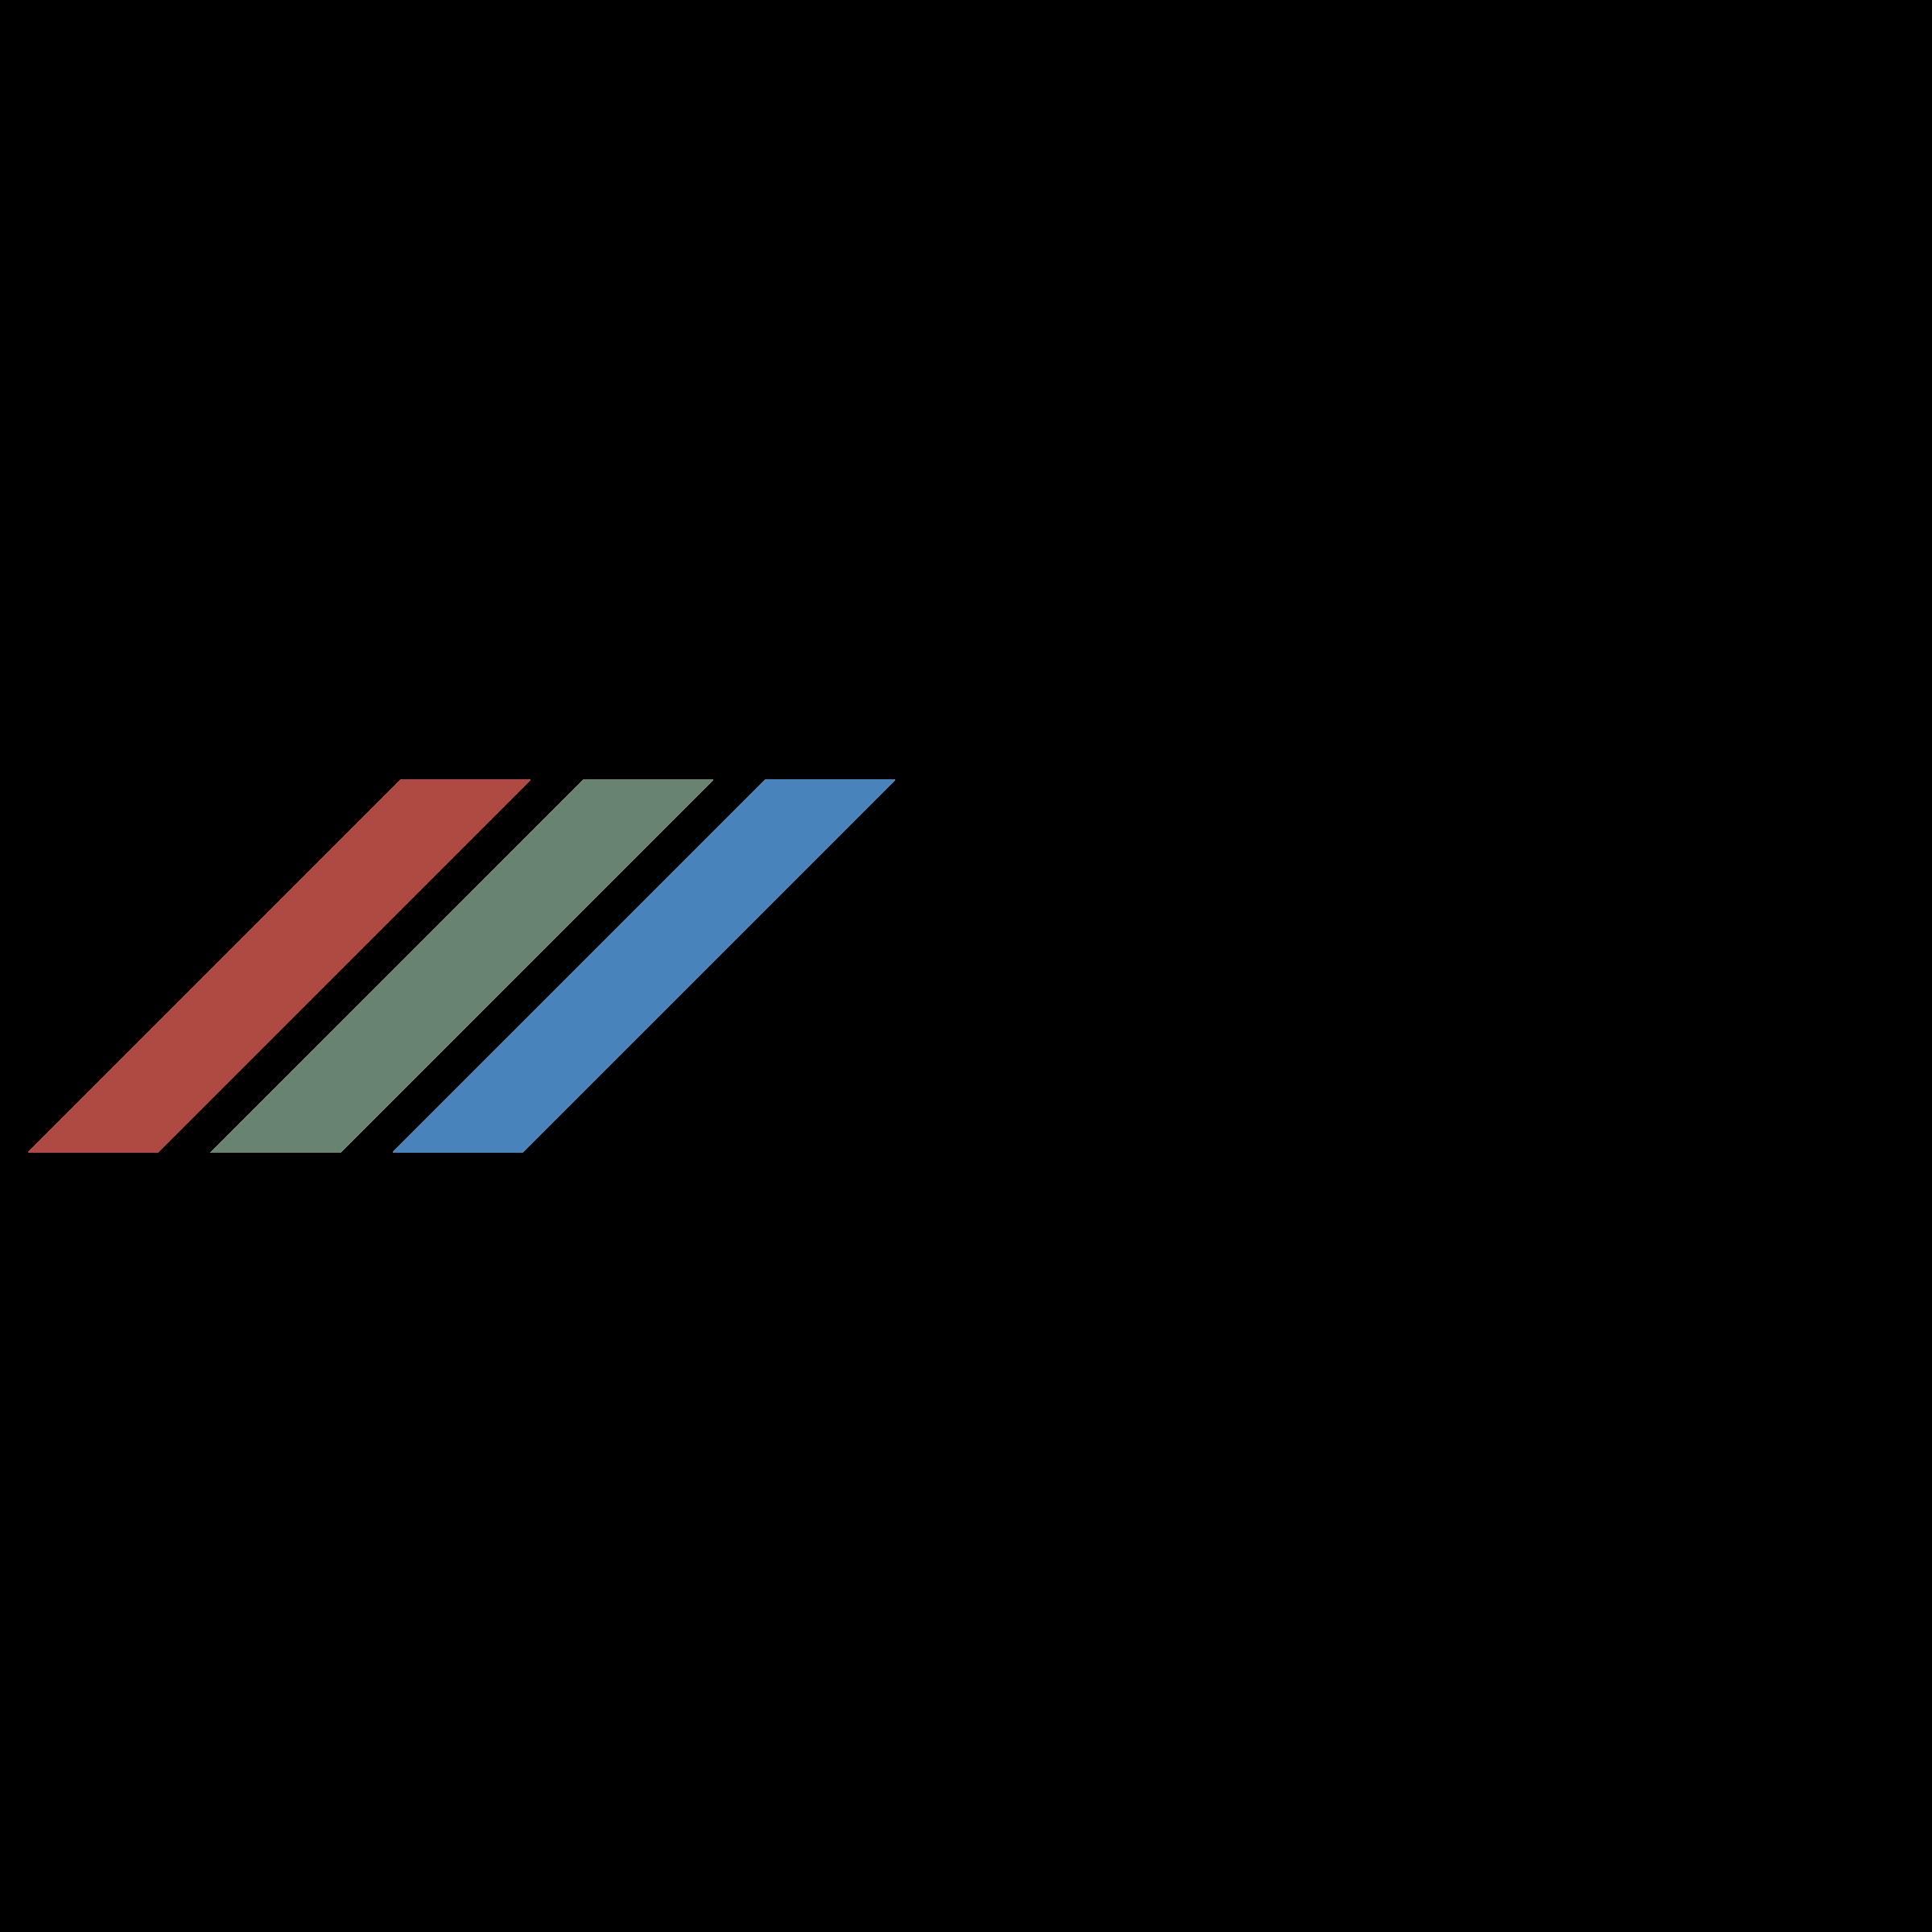 ASK Logo PNG Transparent & SVG Vector.